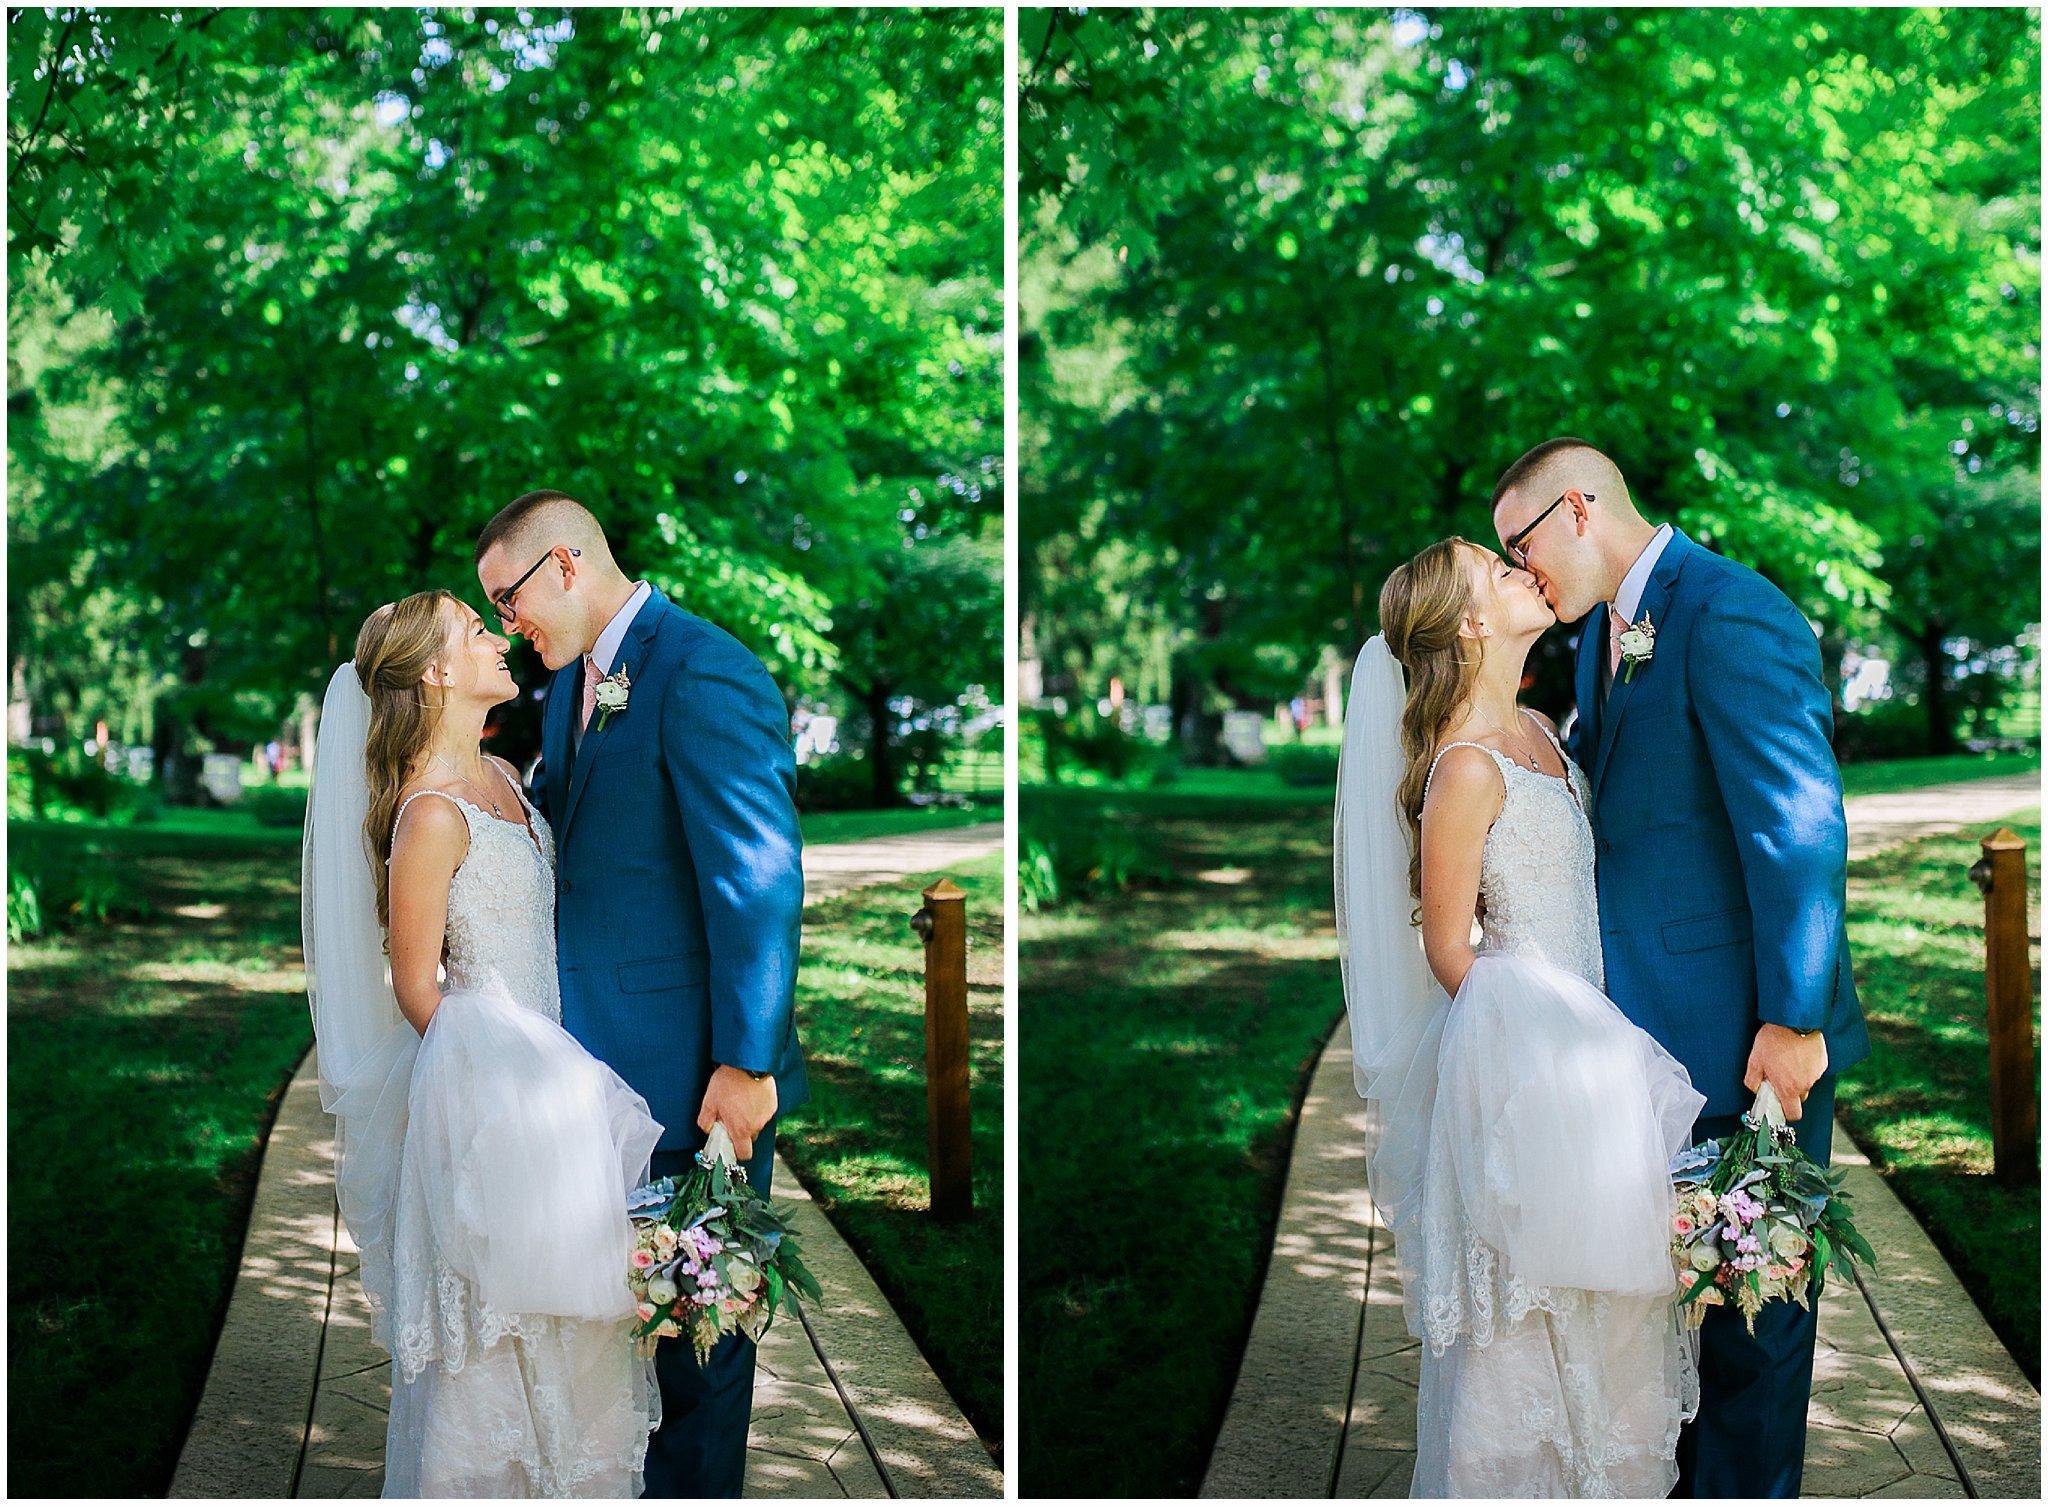 Preston Barn Old Drovers Inn Wedding Rustic Wedding Hudson Valley Photographer Sweet Alice Photography49.jpg